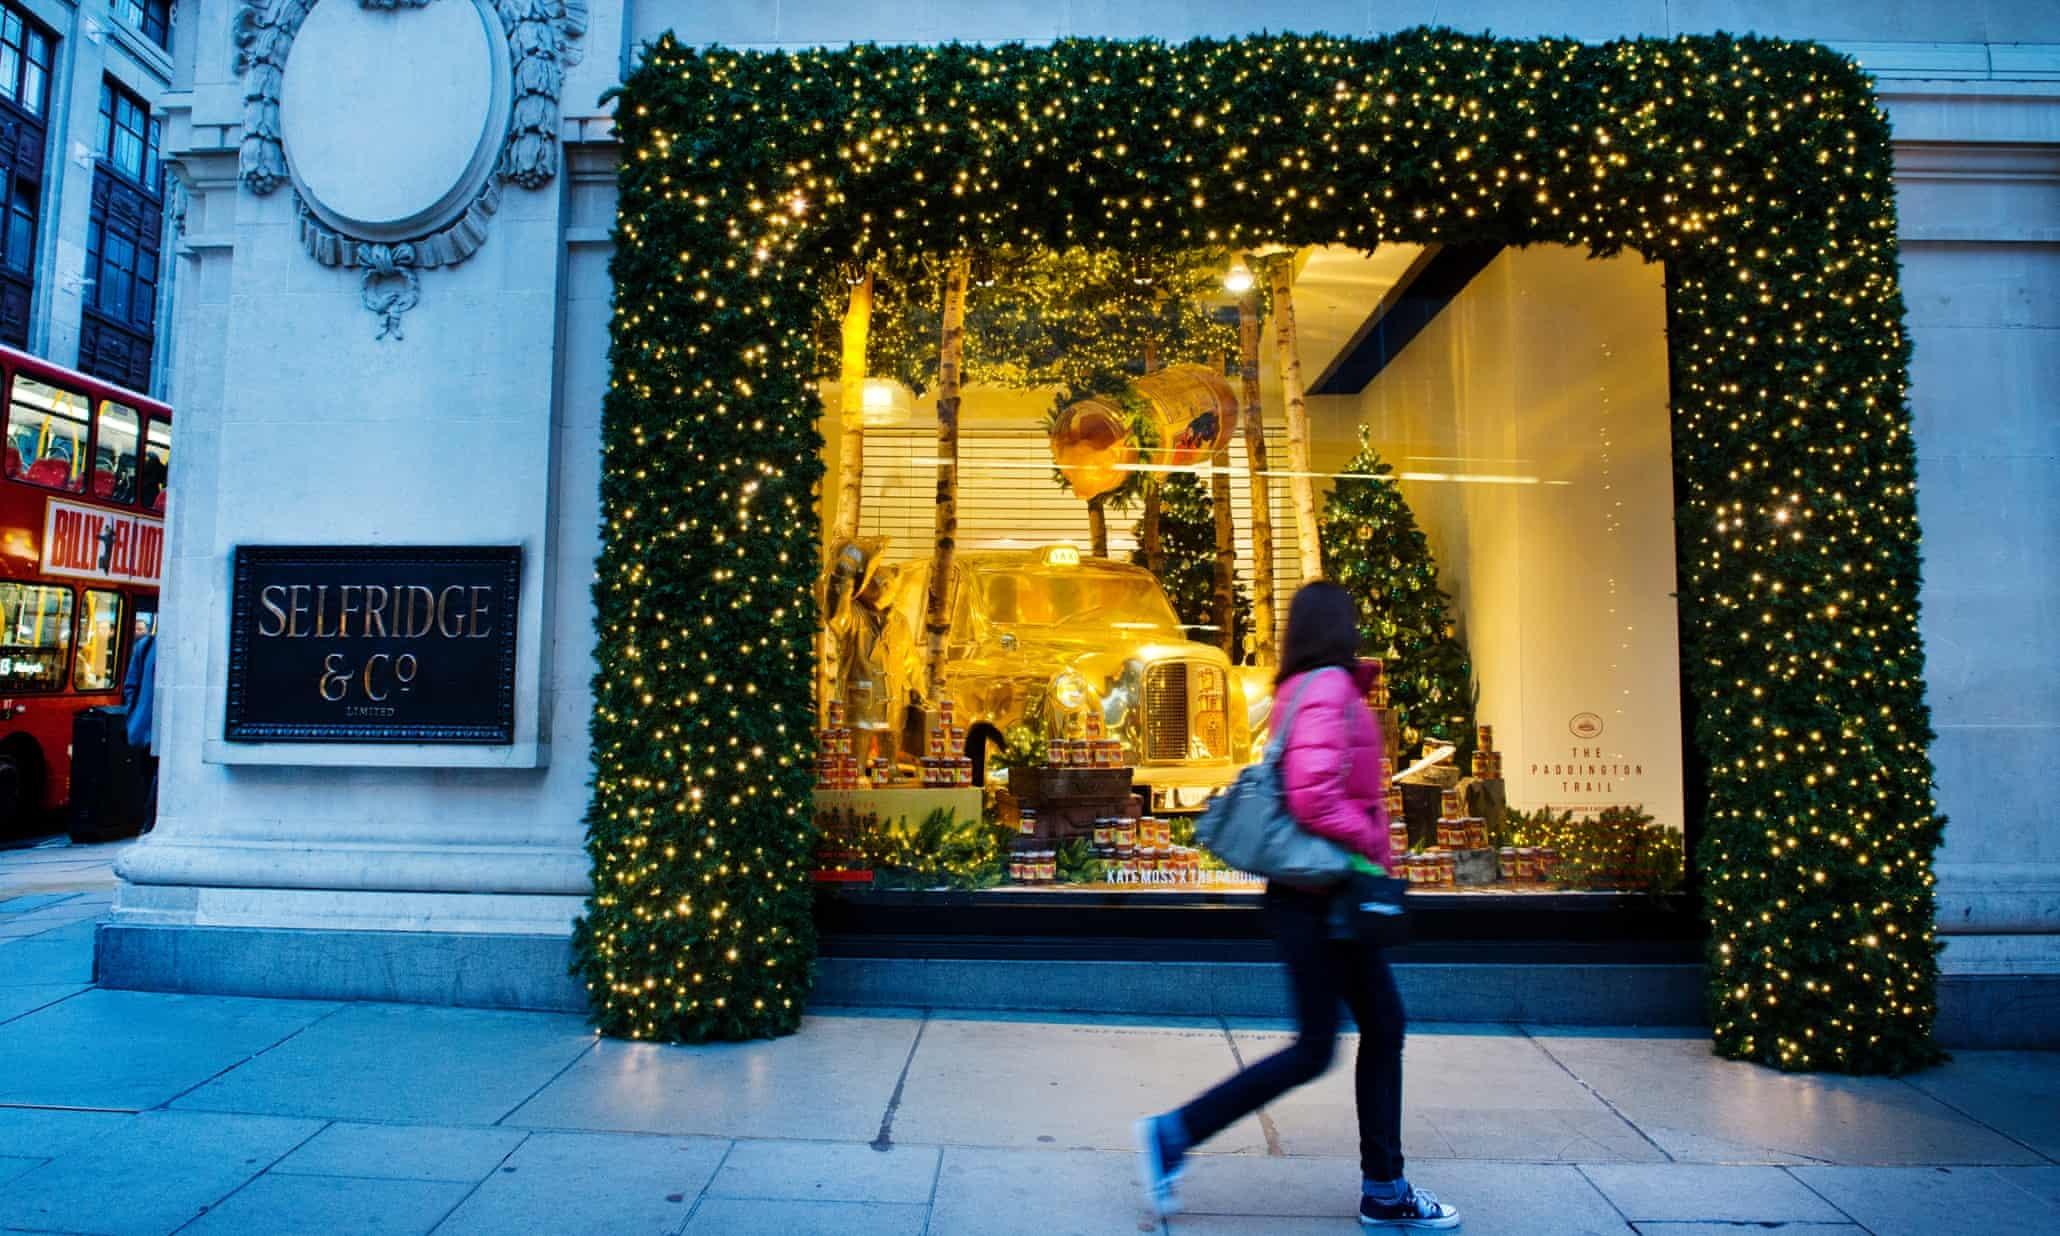 Selfridges' Christmas window displays - in pictures